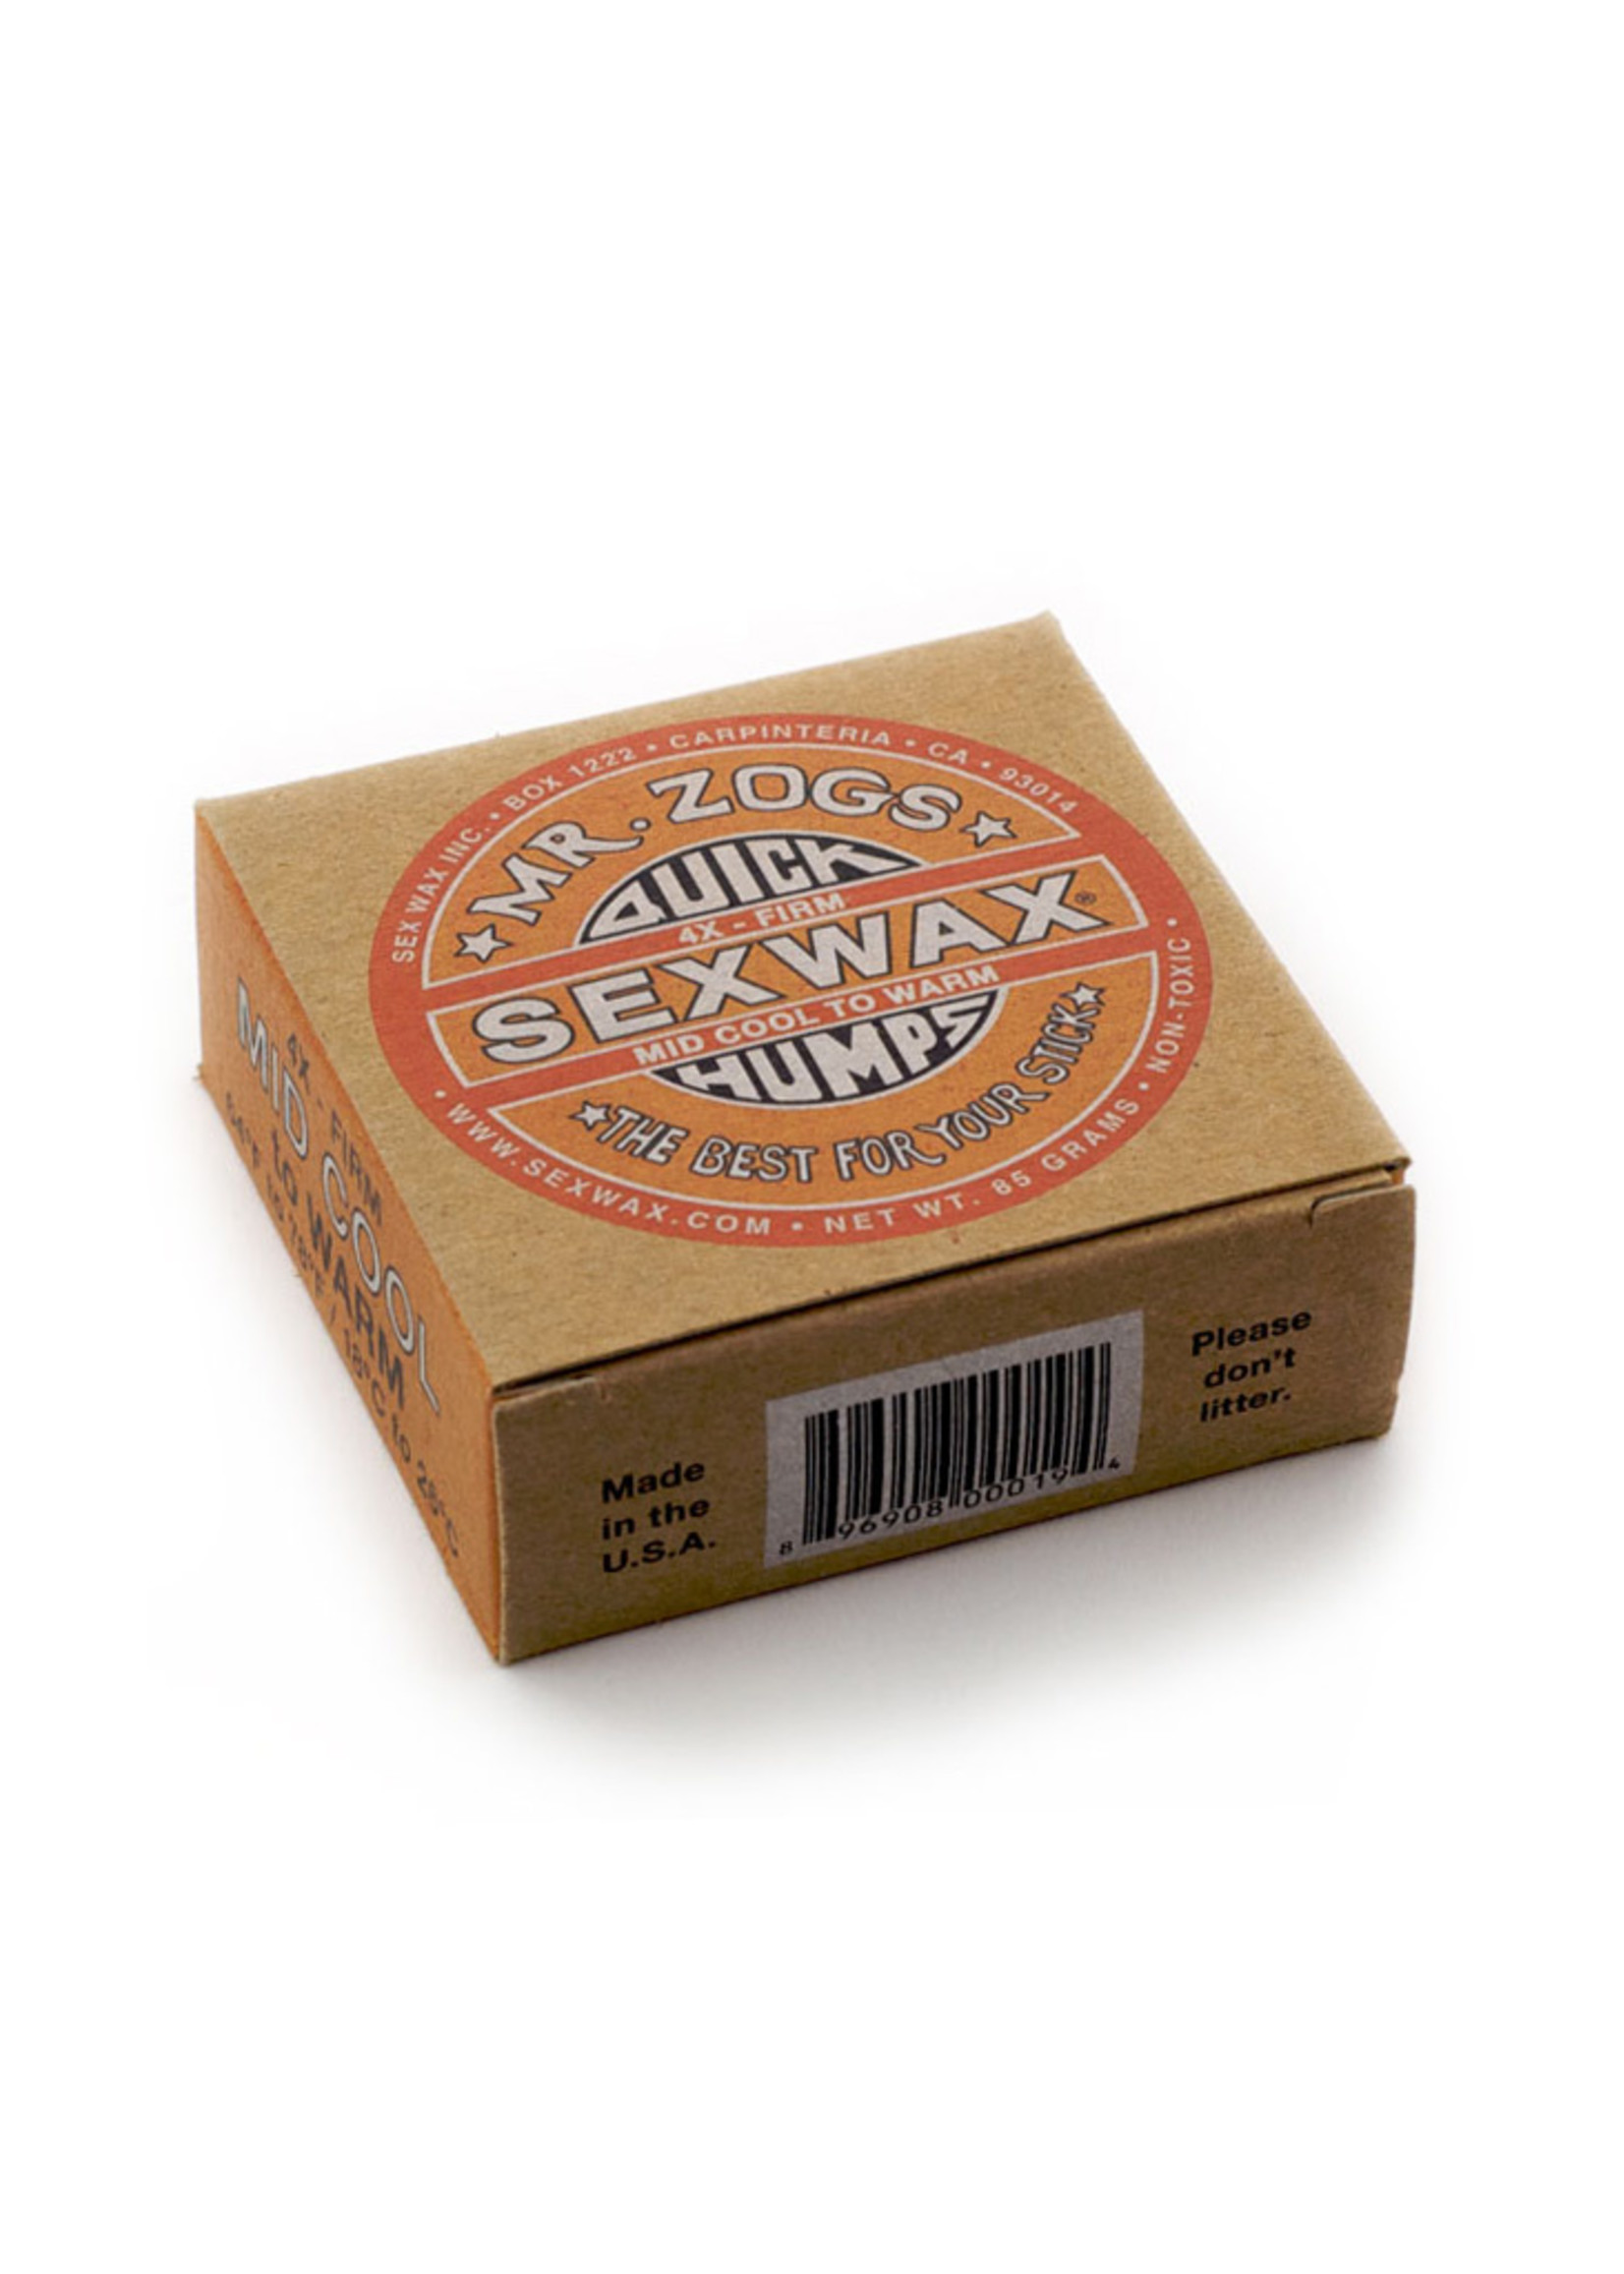 Sex Wax Sex Wax Quick Humps Surf Wax in Eco Box